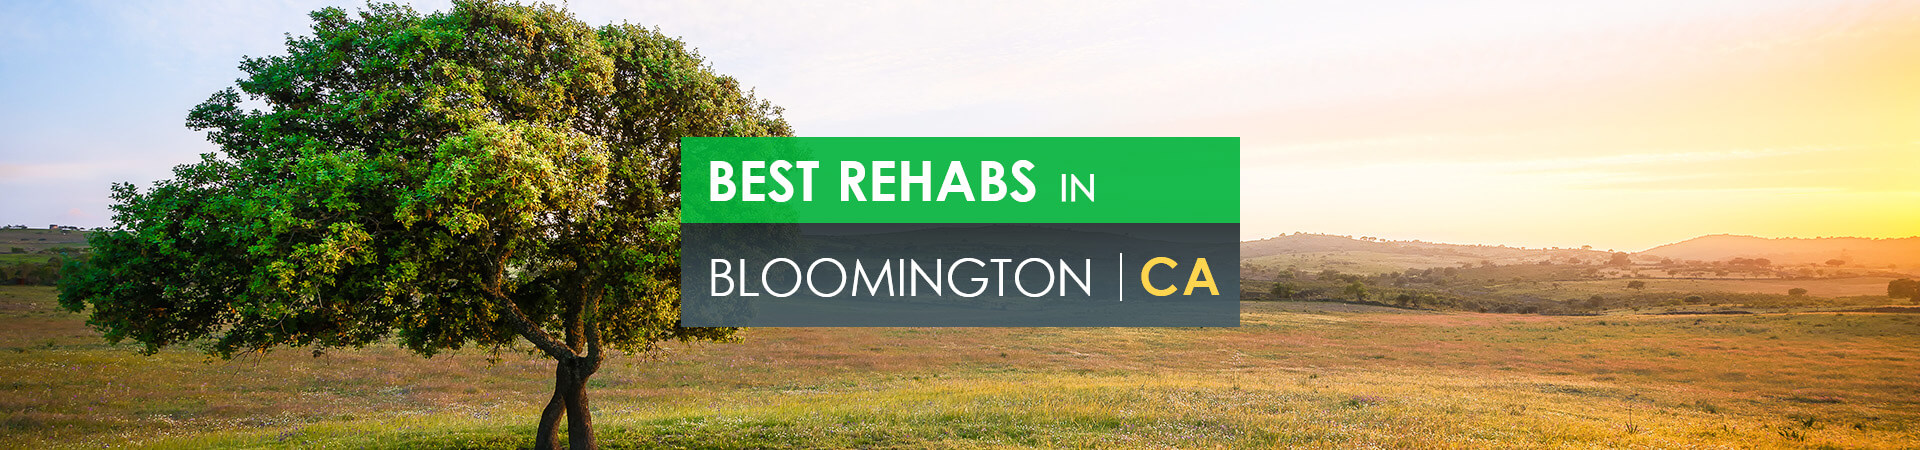 Best rehabs in Bloomington, CA